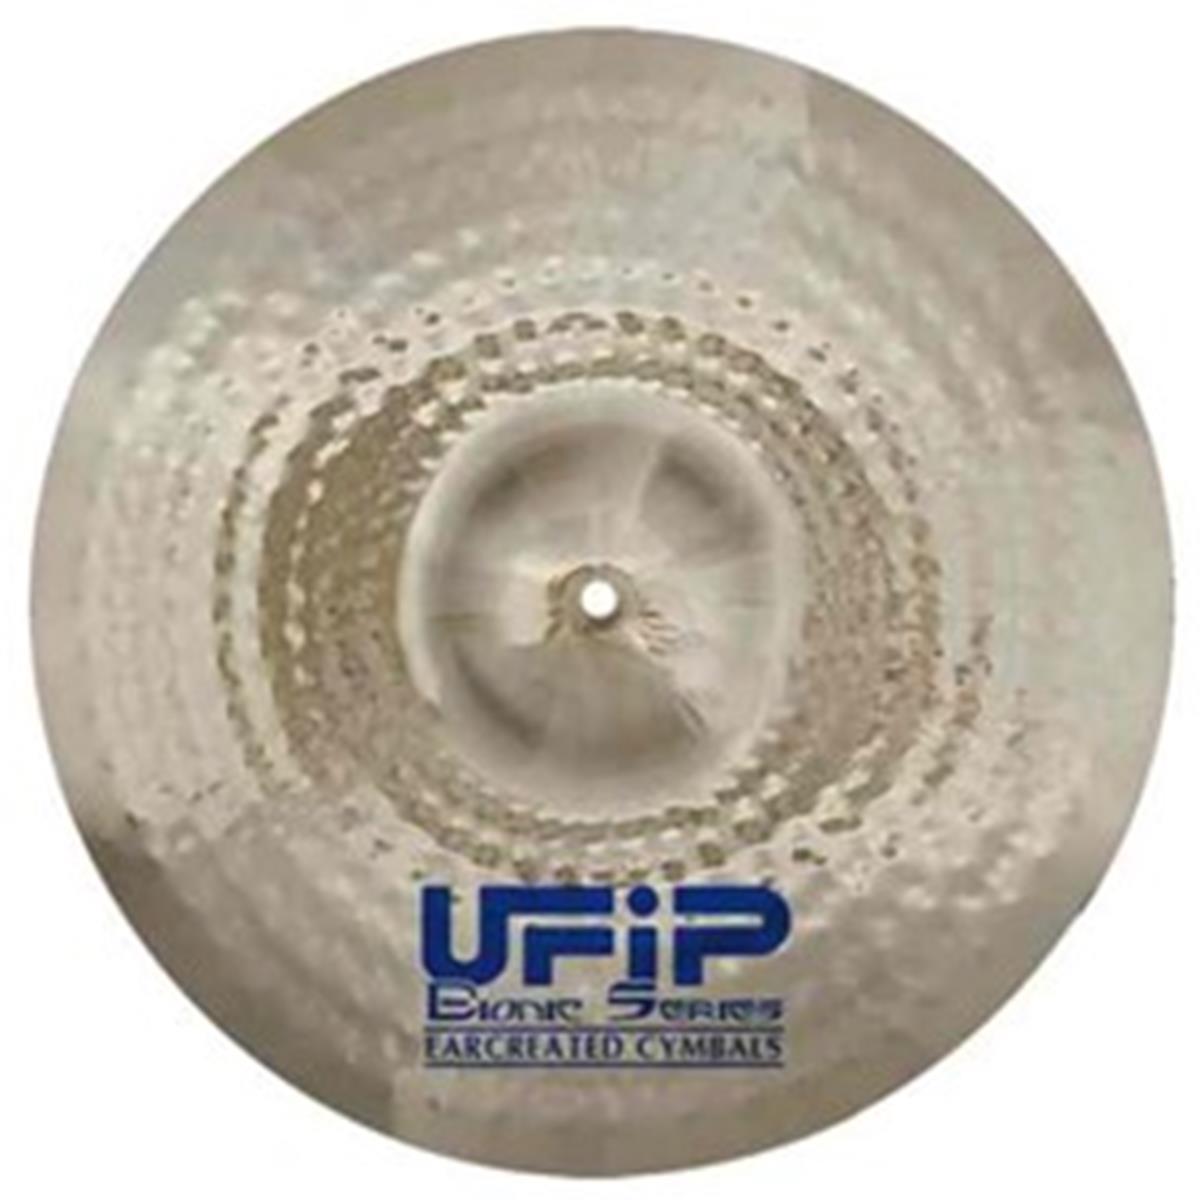 UFIP-BI-20CR-Bionic-Series-20-Crash-Ride-sku-14158